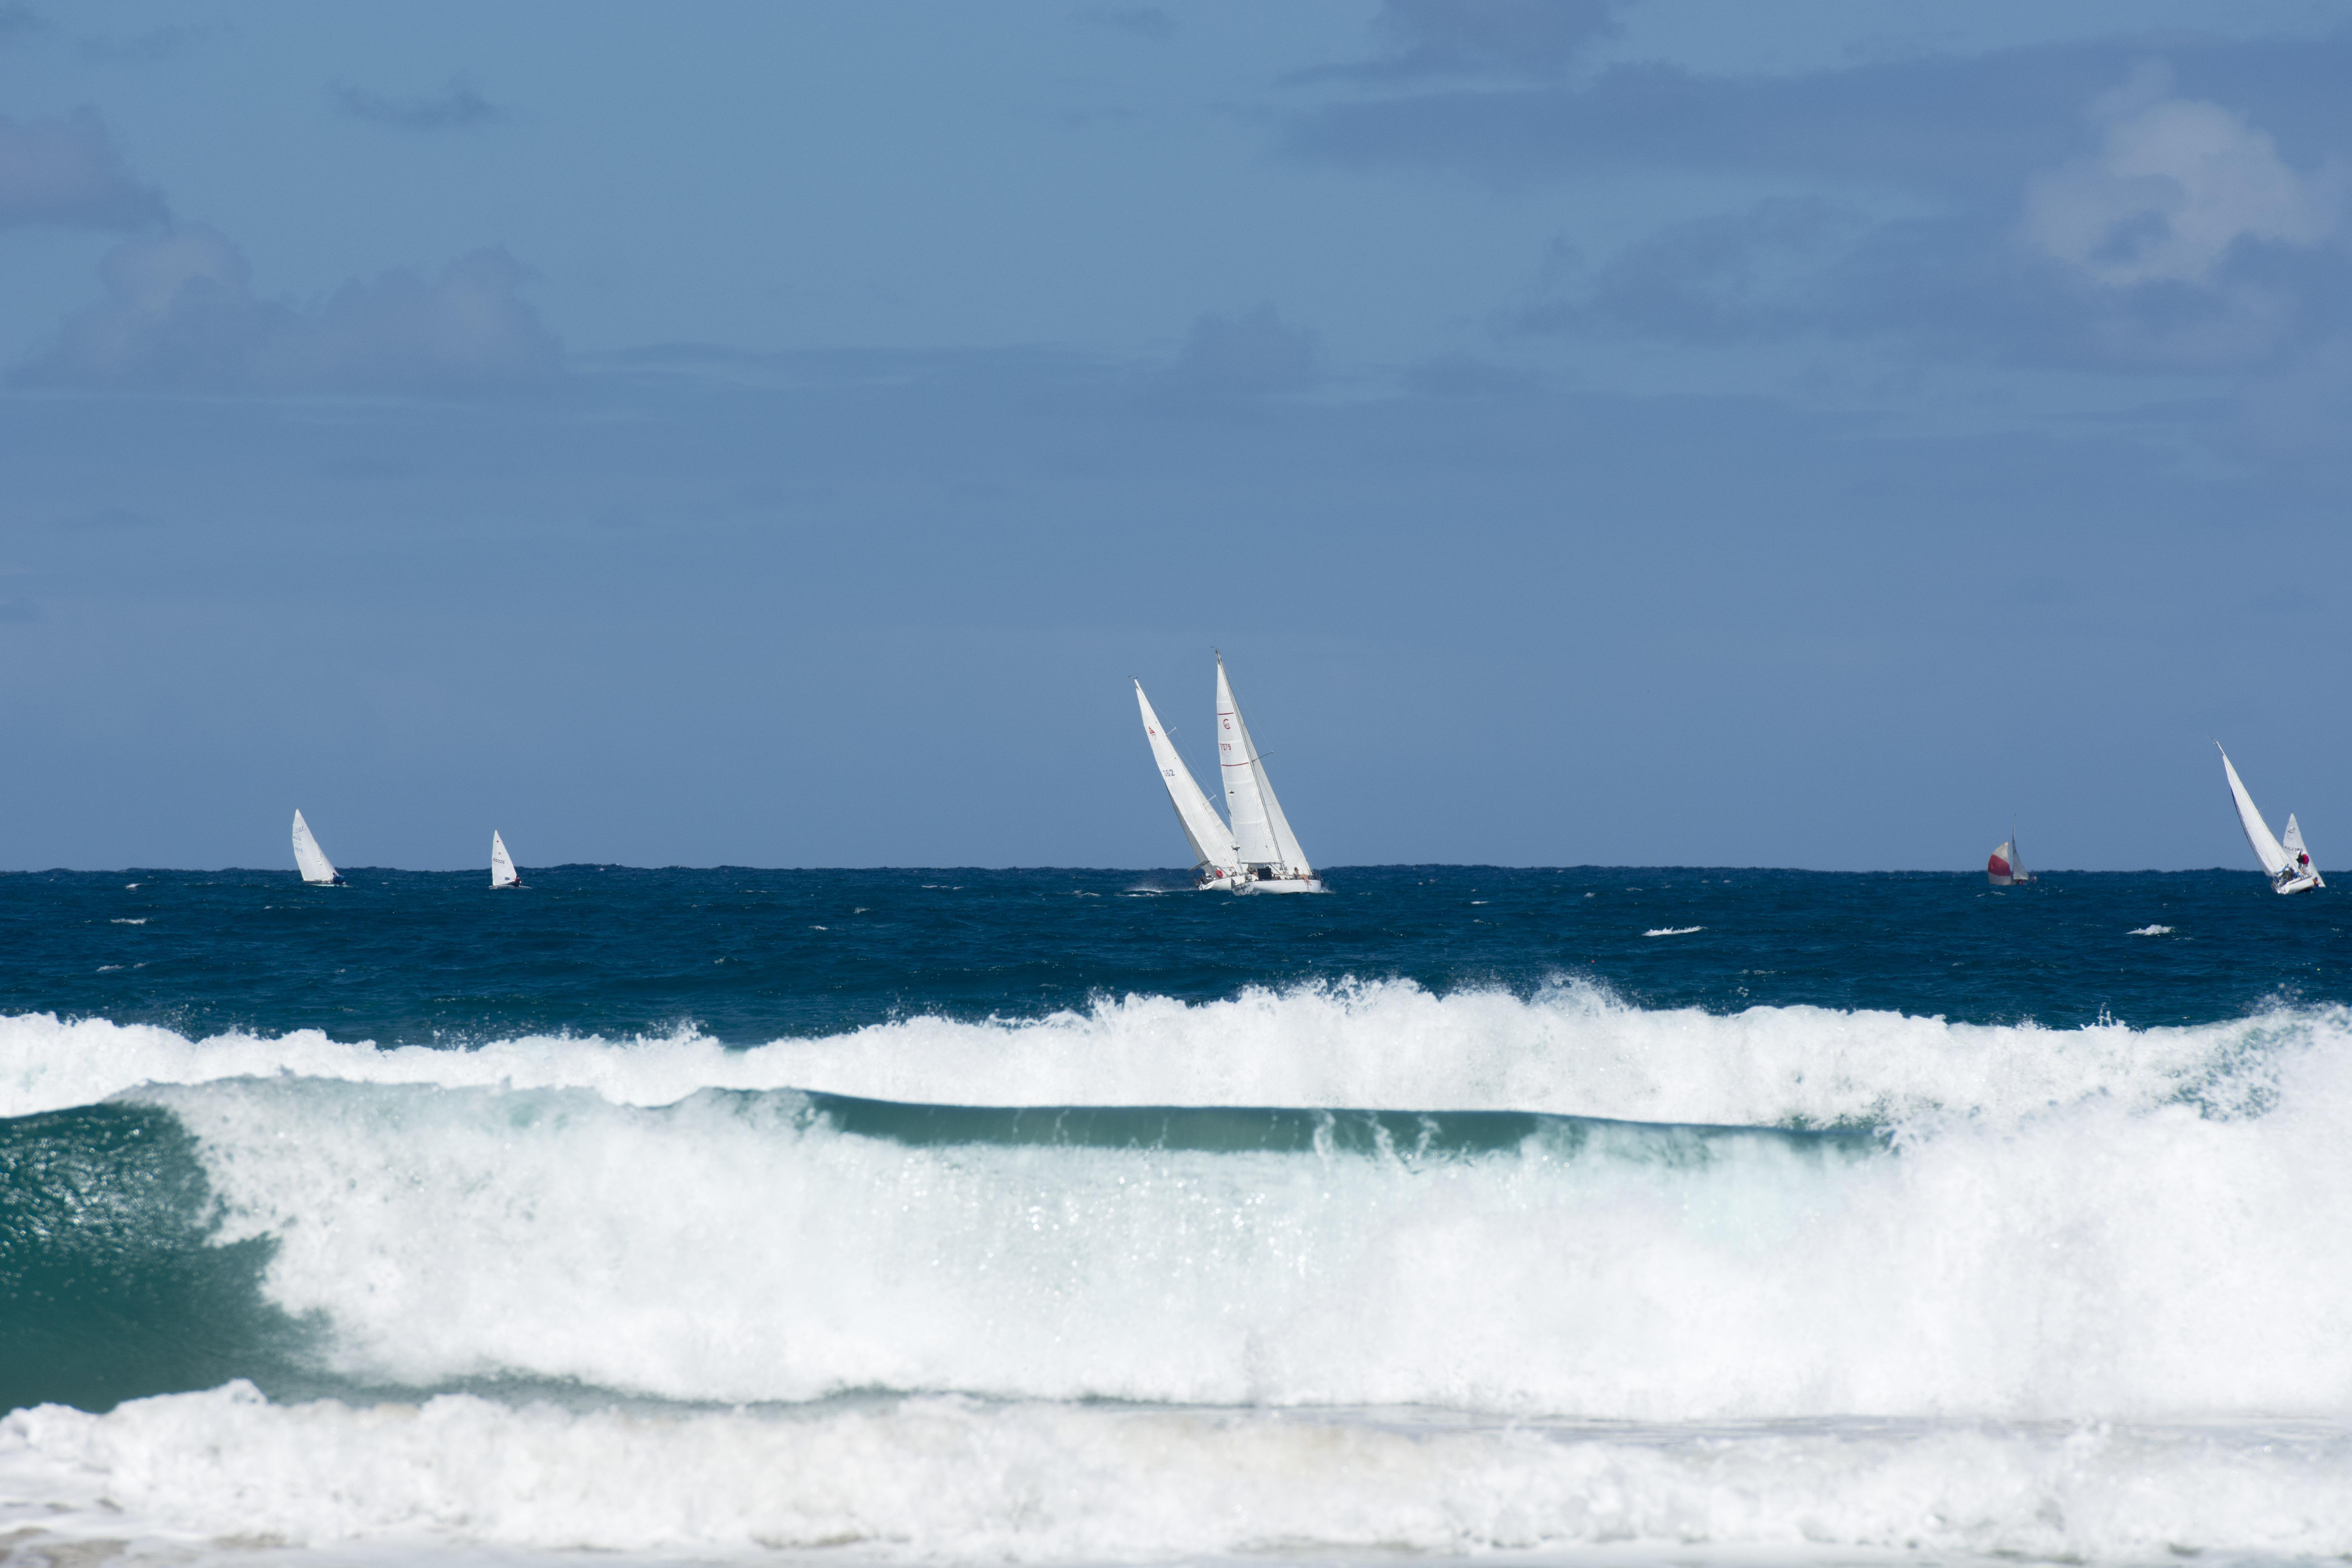 Blue sky and sails